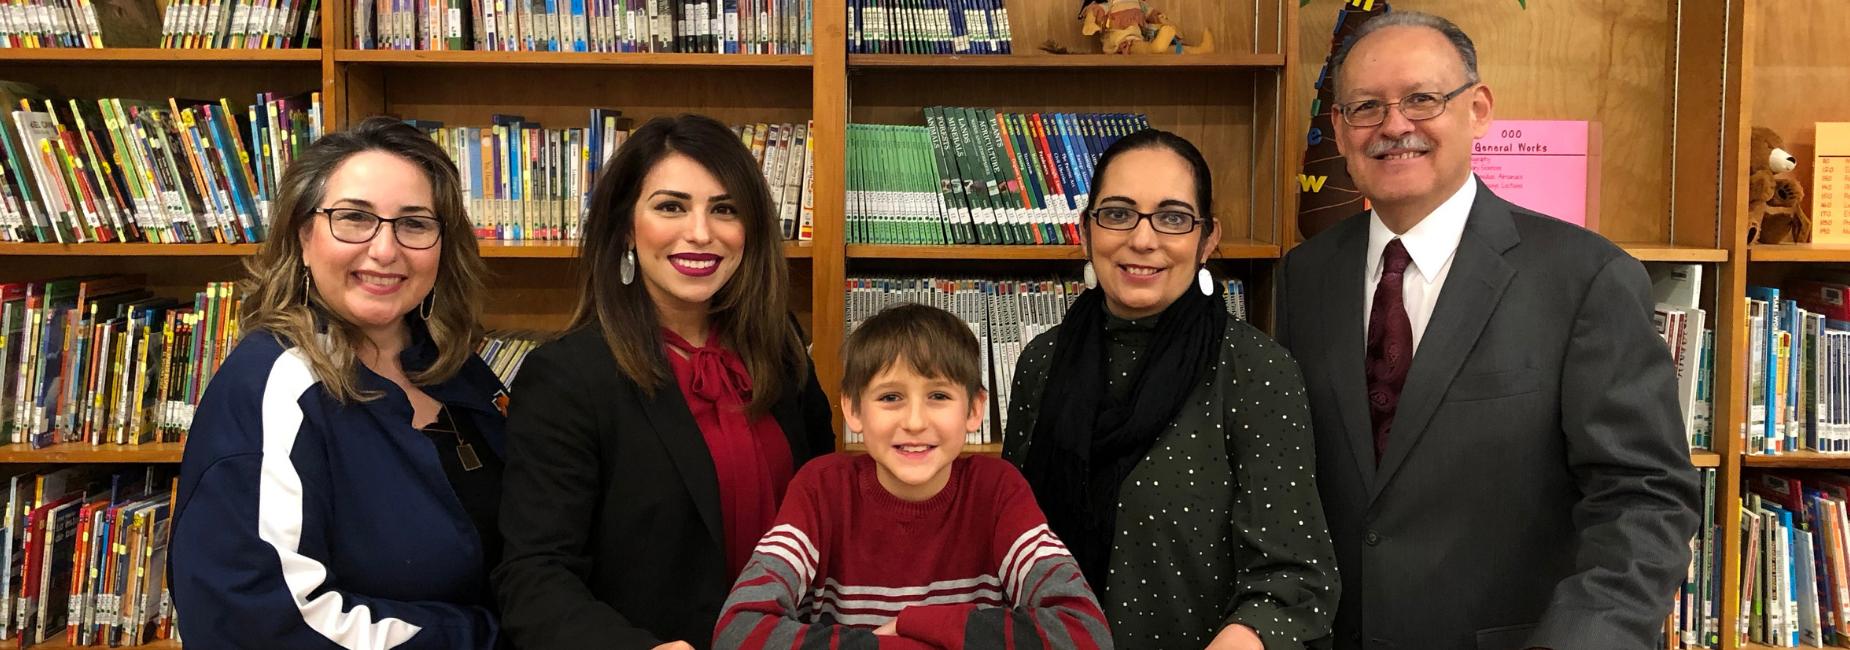 School Board Appreciation Month with Board Member Sam Saldivar